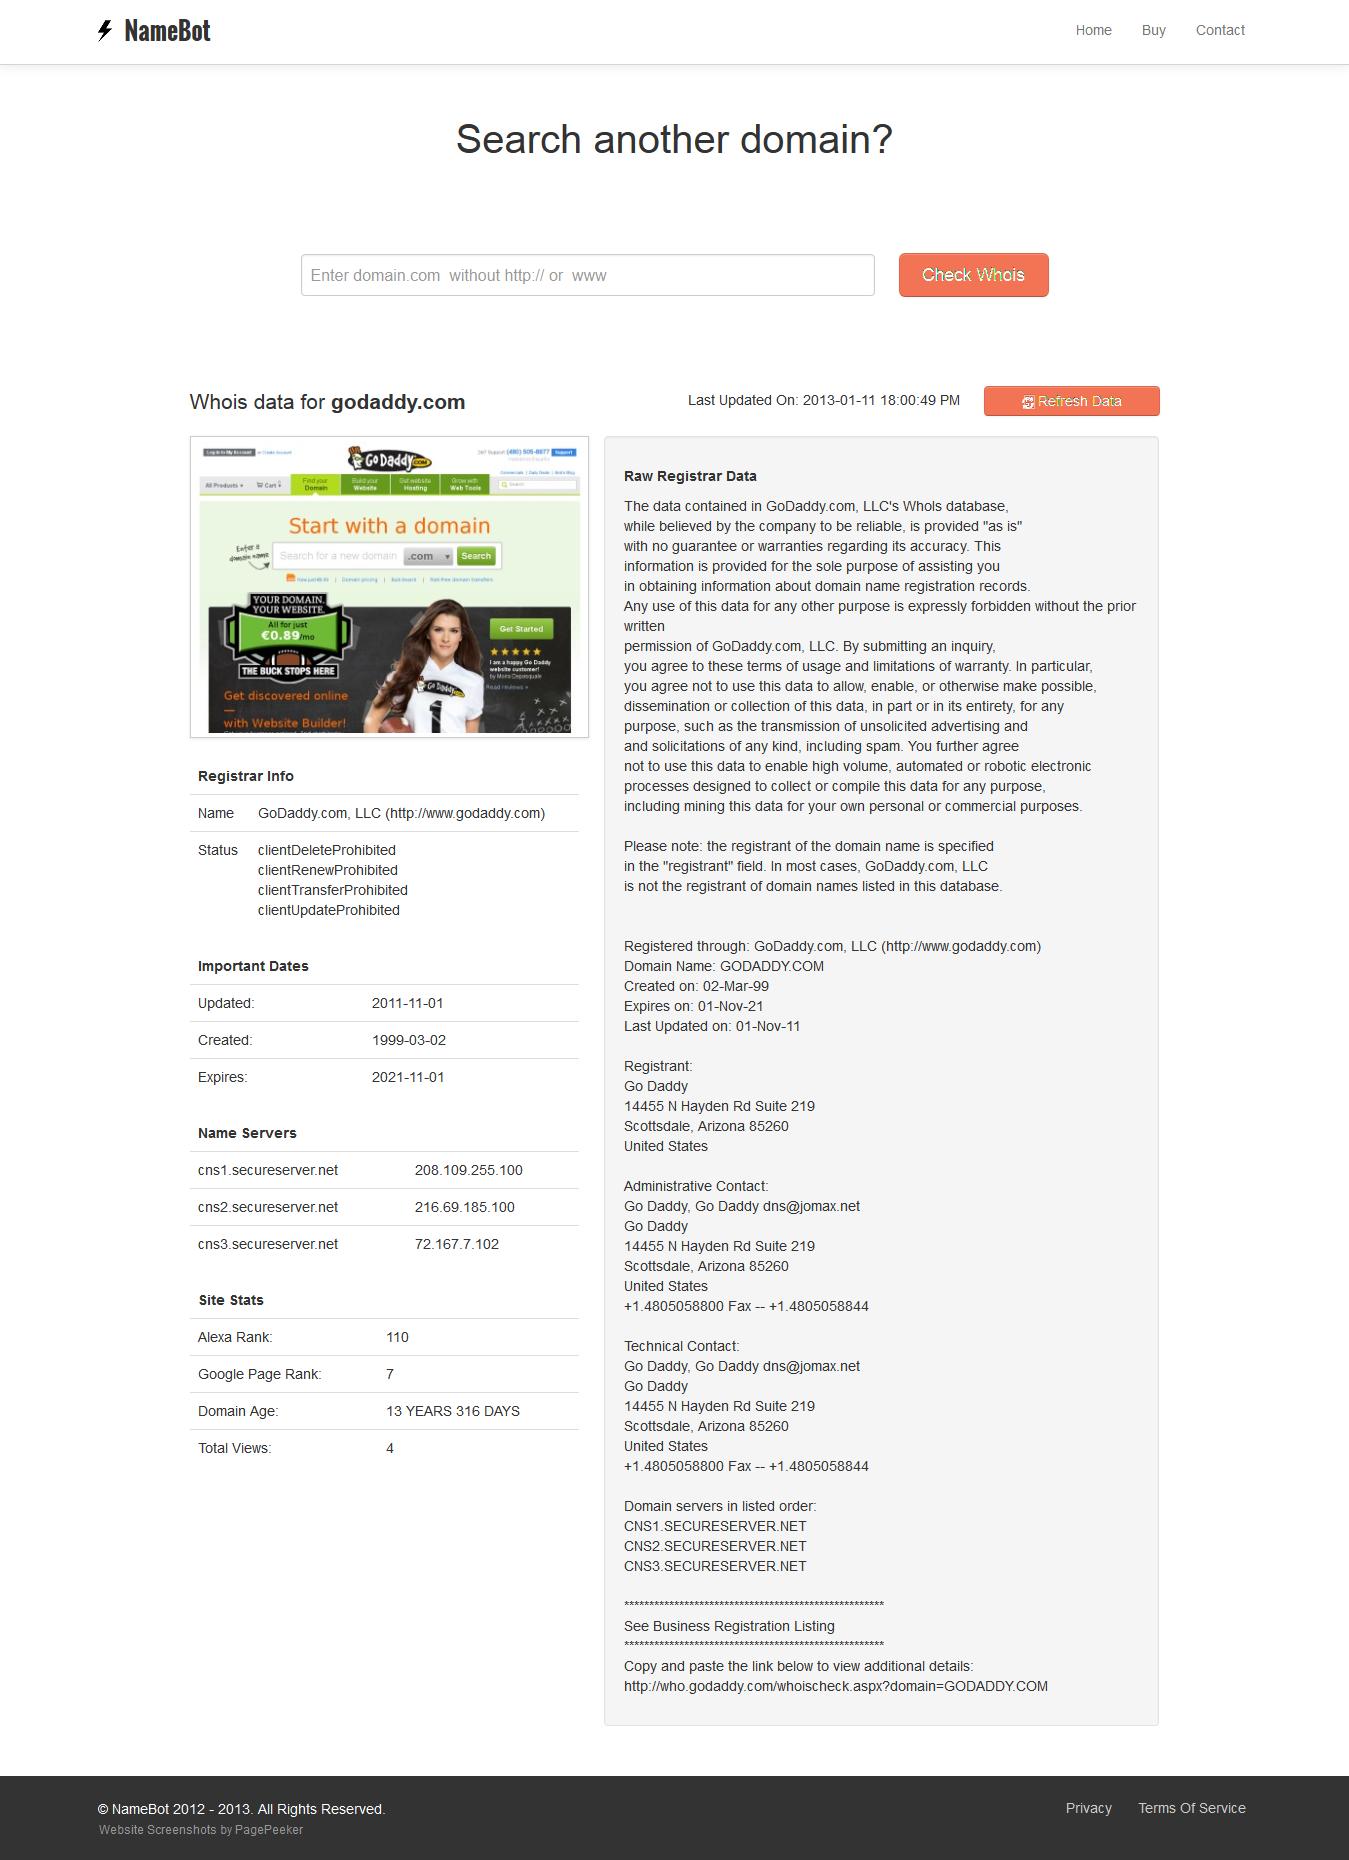 NameBot-screenshot-result